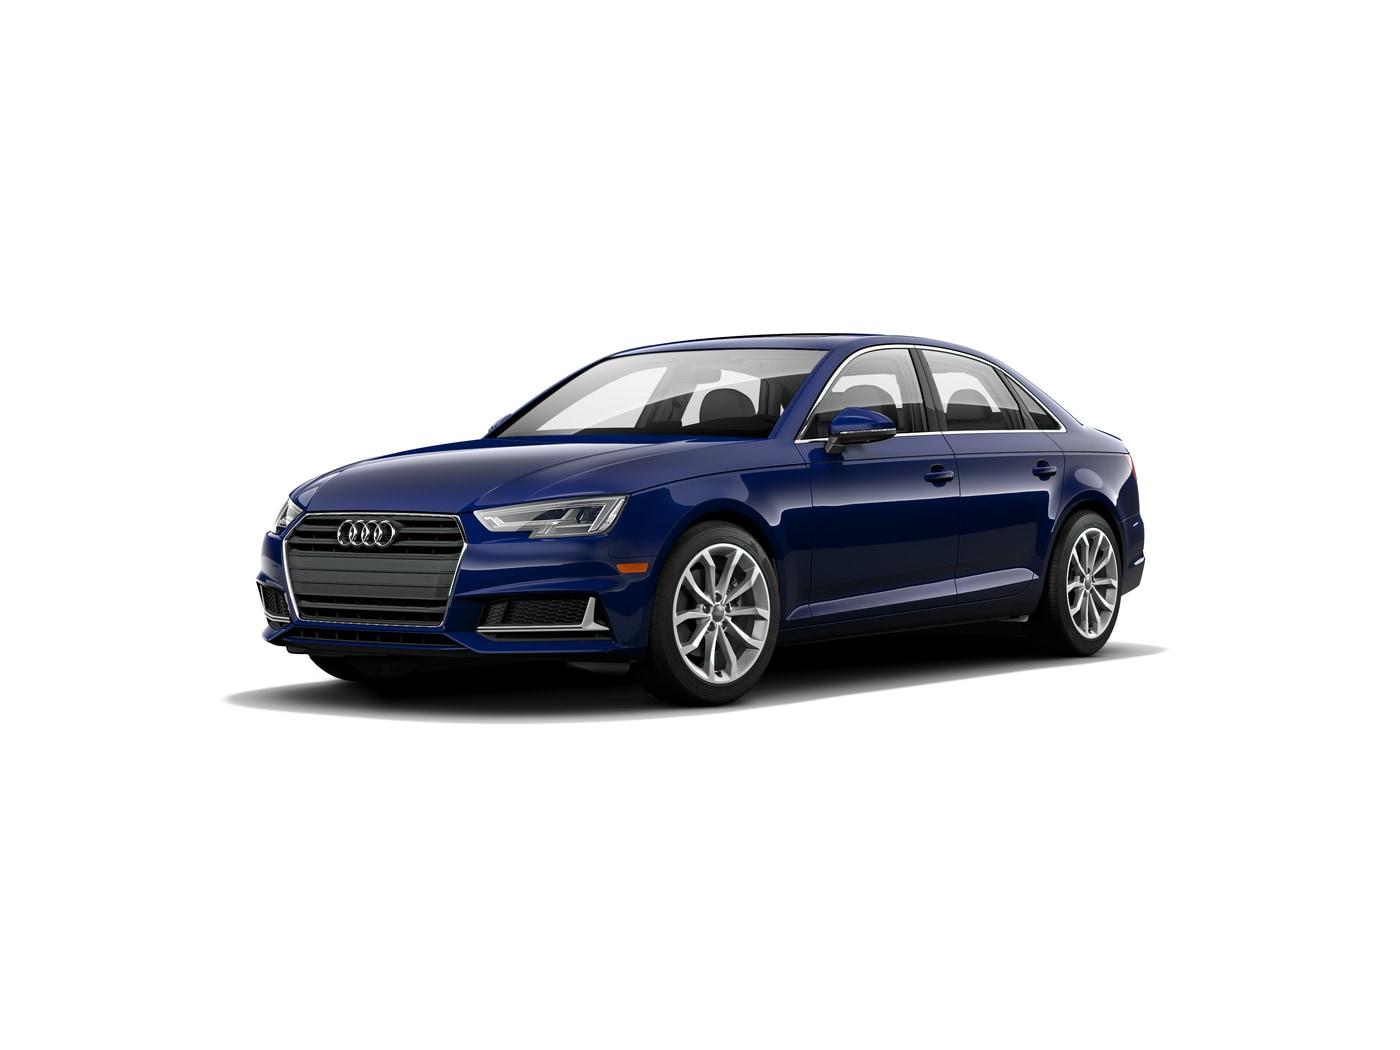 2019 Audi A4 2.0 TFSI Premium Plus S Tronic FWD